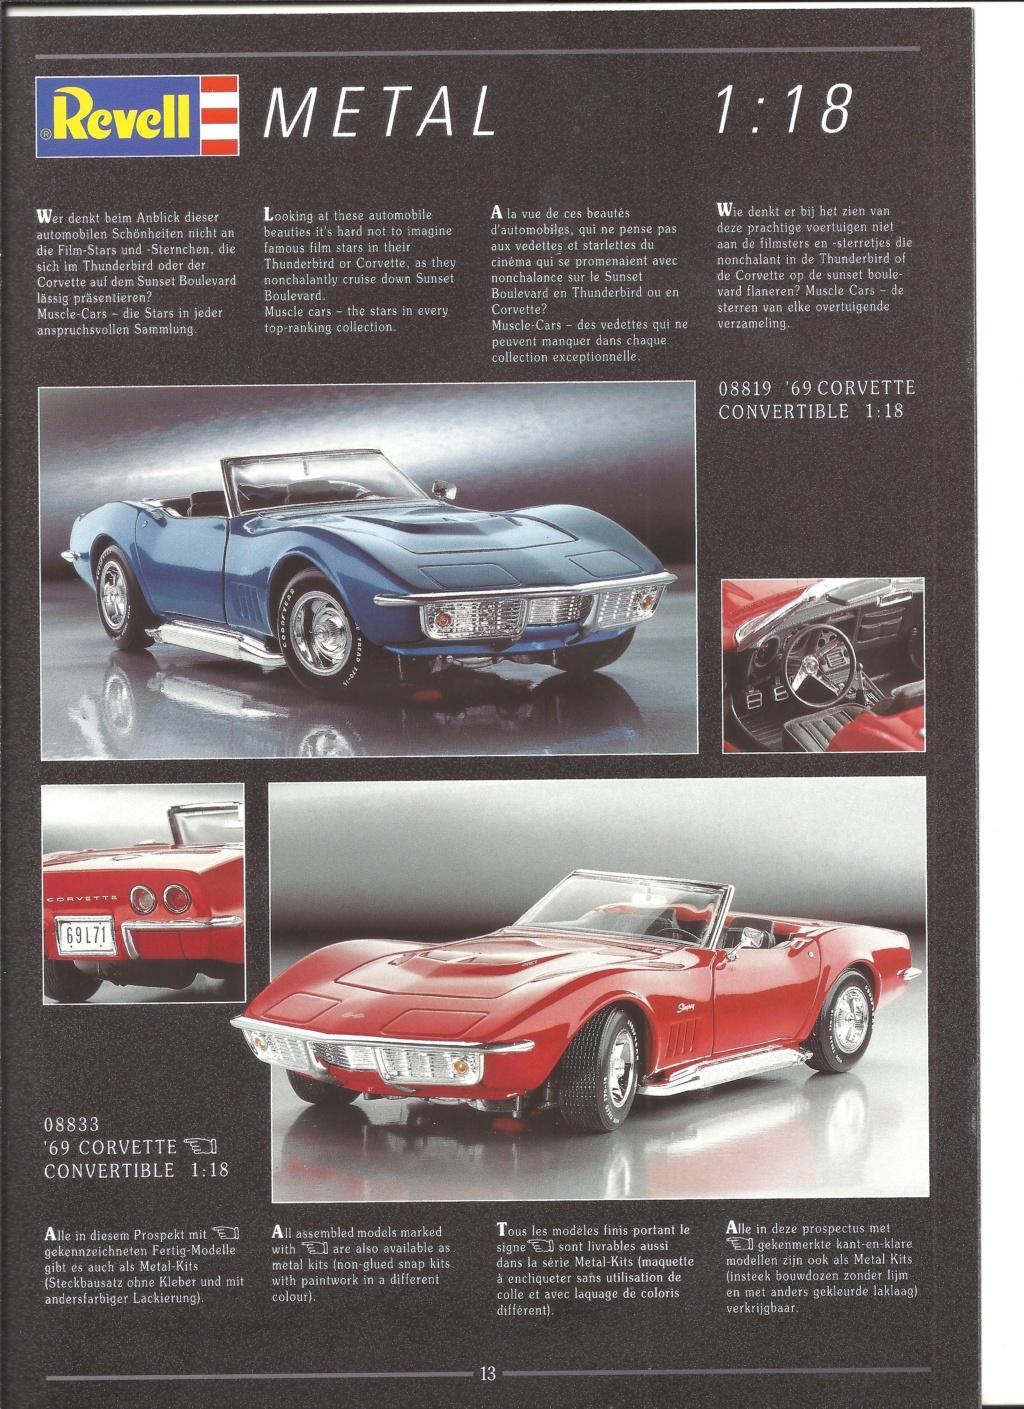 [REVELL 1995] Catalogue METAL miniatures 1995  Revell45